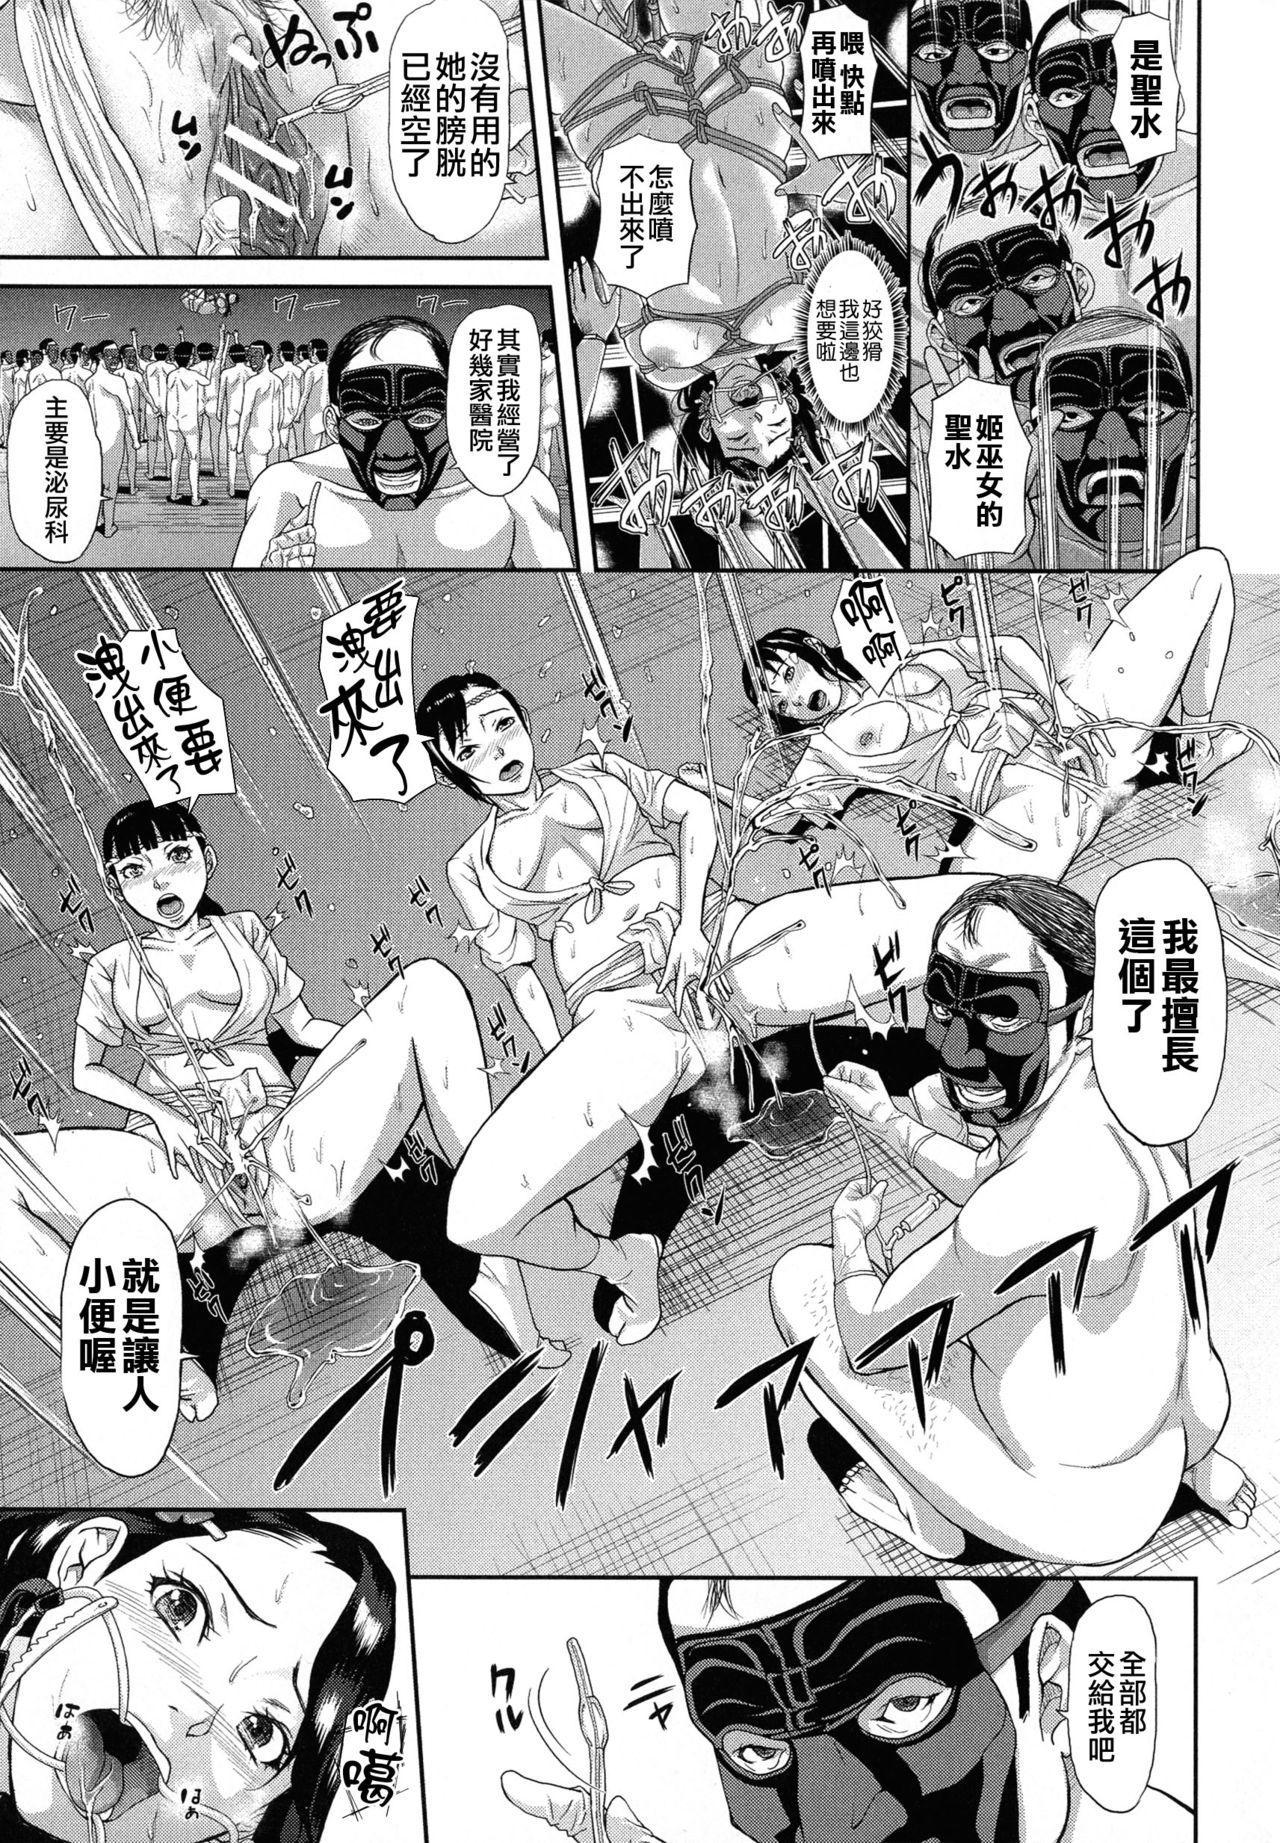 [Honebuto Danshaku] Innou Kaizou Program ~Oyako Zecchou Cult Ochi~ [Chinese]【不想记名重嵌--高质量图源】 185